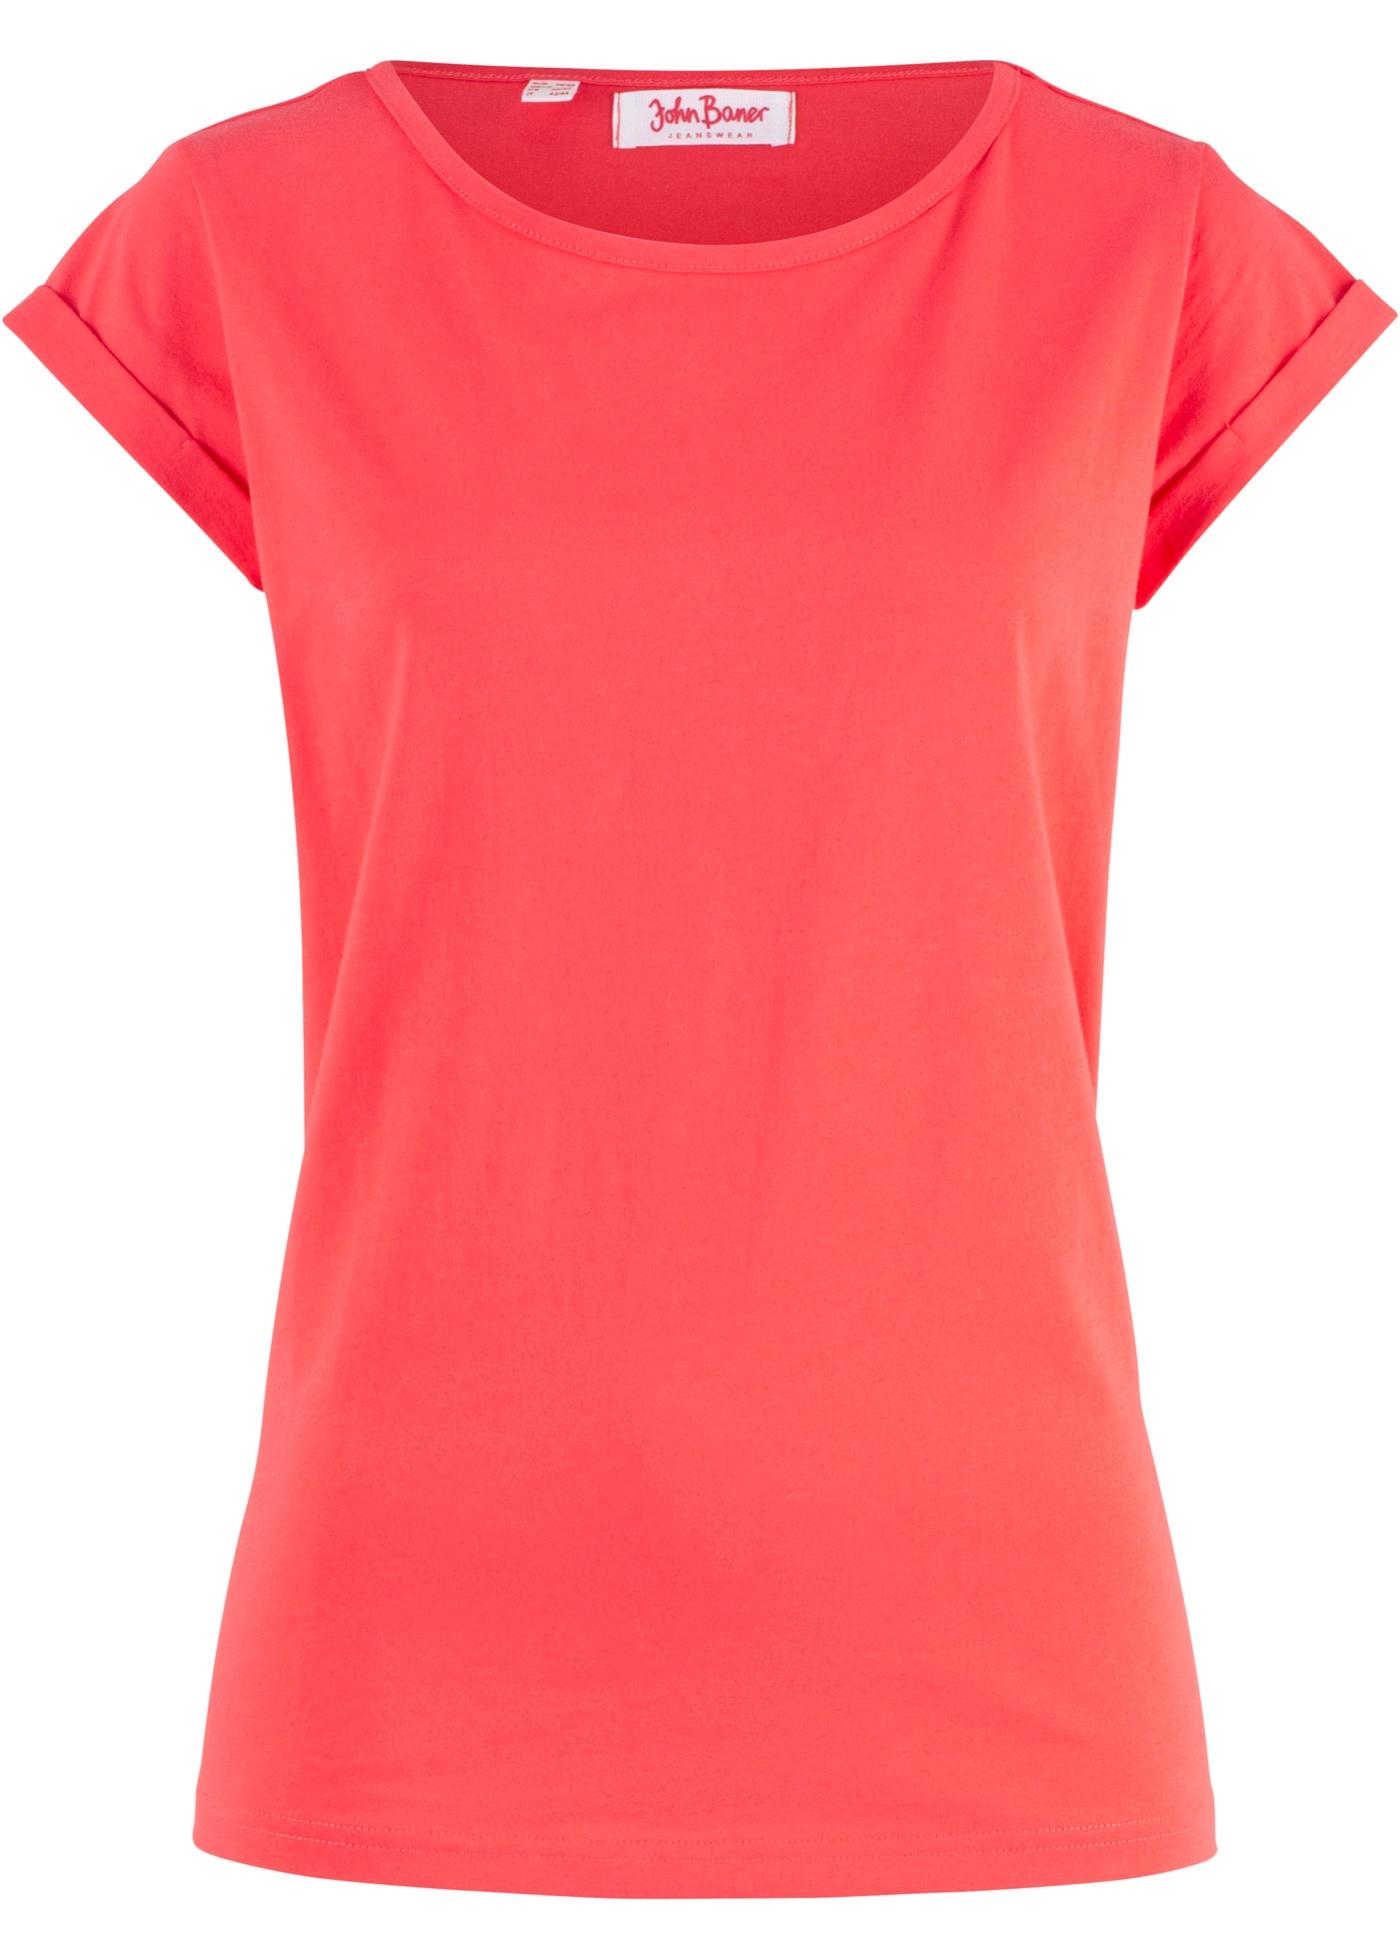 Baumwoll Shirt, Kurzarm